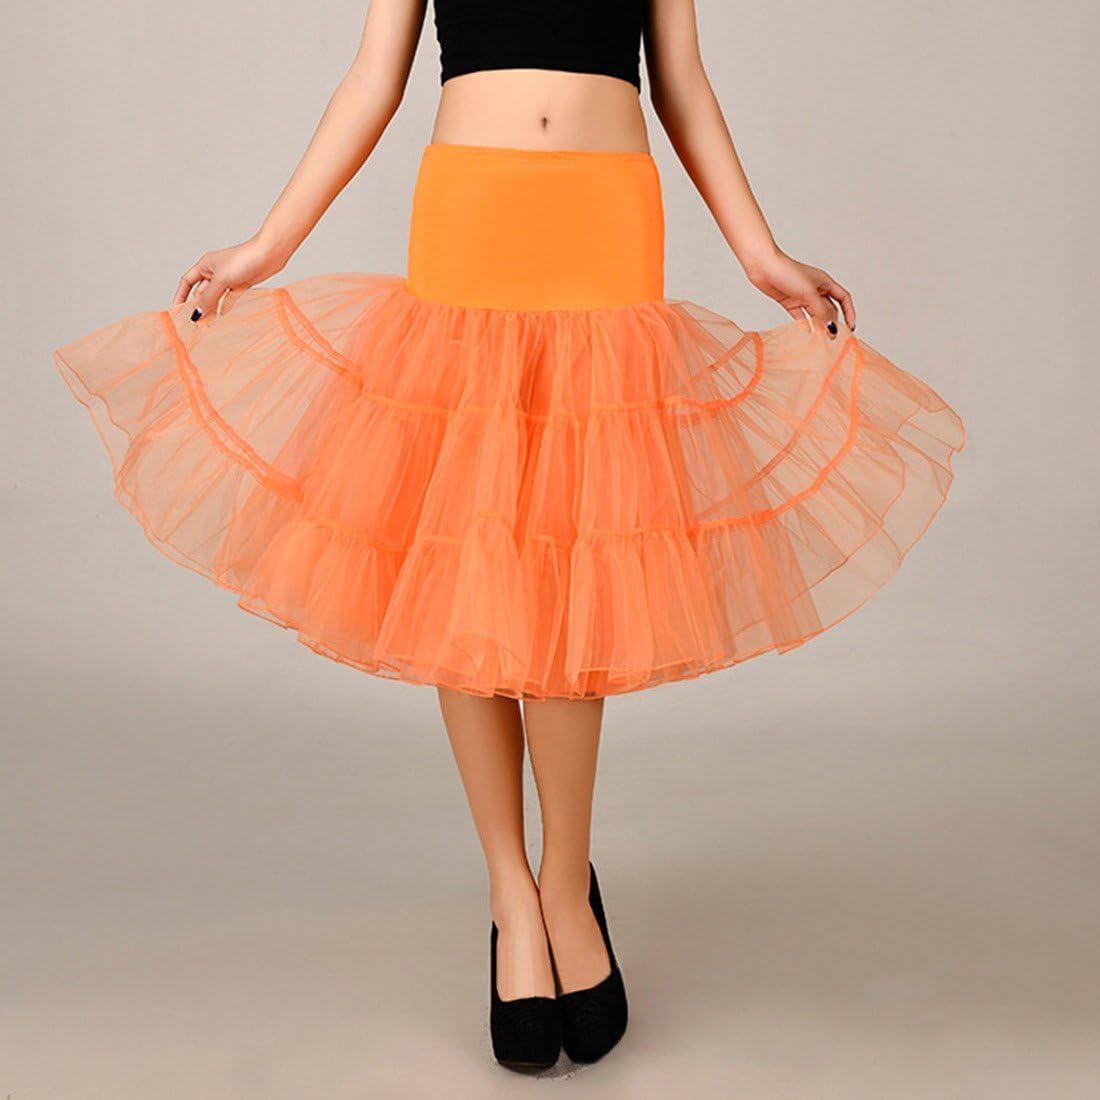 Falda de tul para boda de 10 colores naranja naranja M: Amazon.es ...